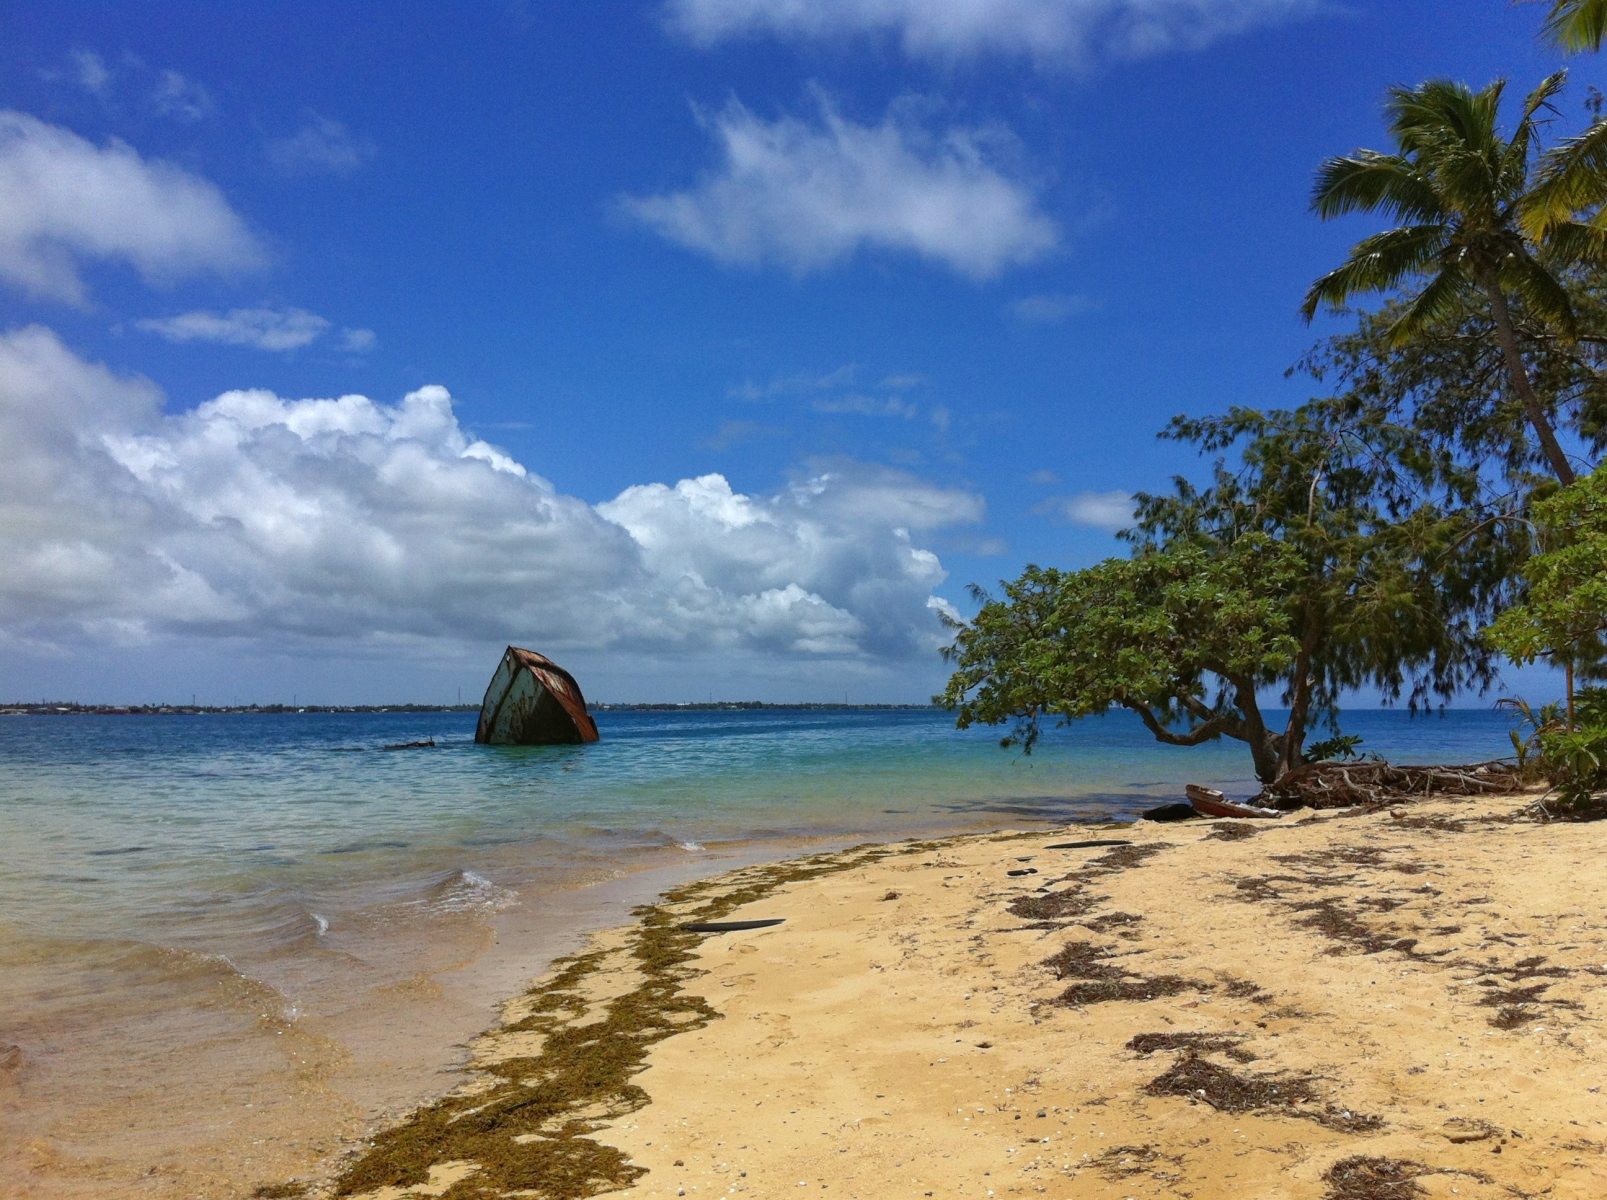 Photo Taken In Tonga, Nukualofa